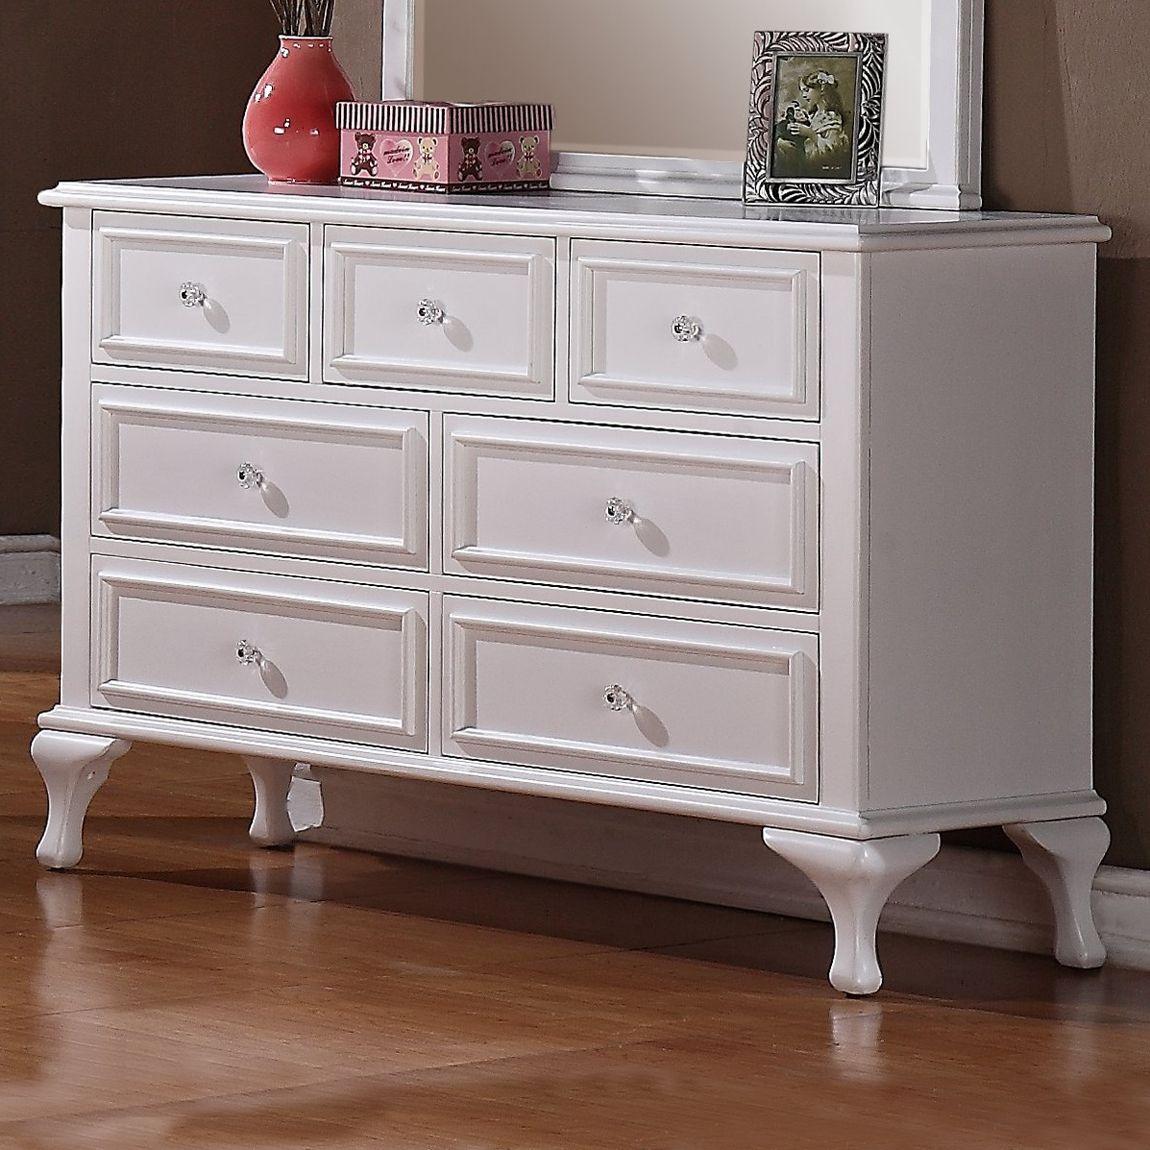 Elements International Js700dr Jillian Dresser Picket House Furnishings White Dresser 7 Drawer Dresser [ 1150 x 1150 Pixel ]